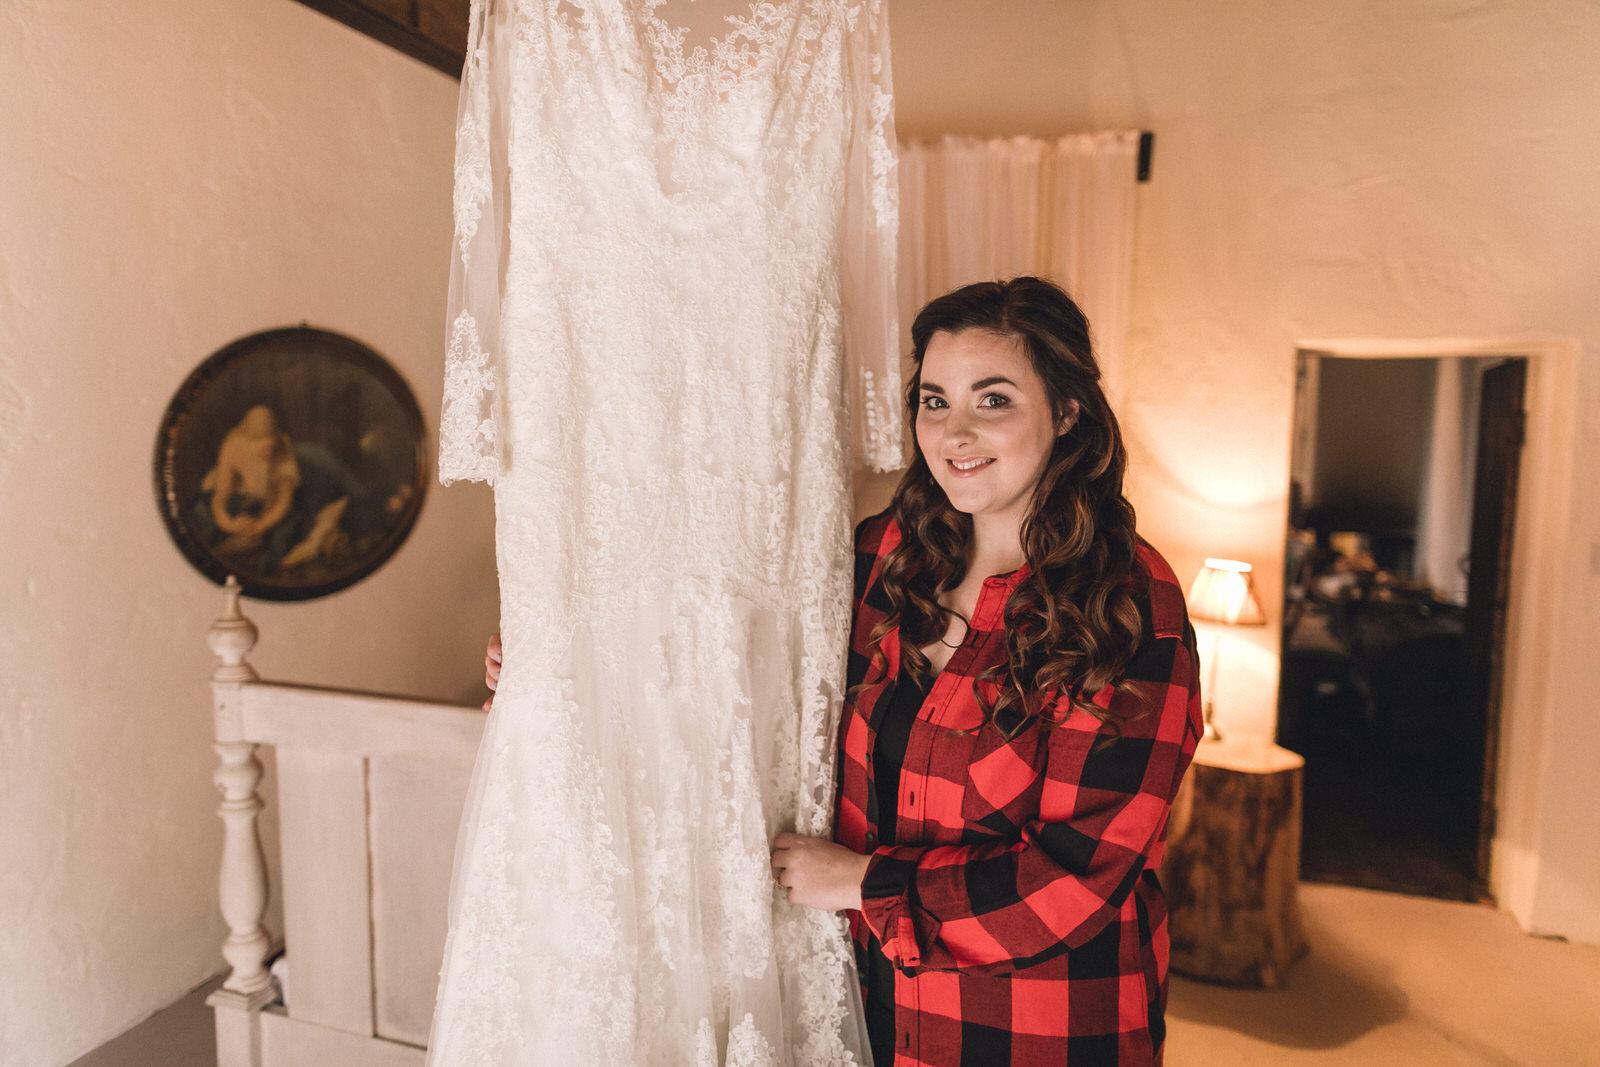 Balybeg-house-ireland-wicklow-wedding-photographer-roger-kenny_greystones028.jpg